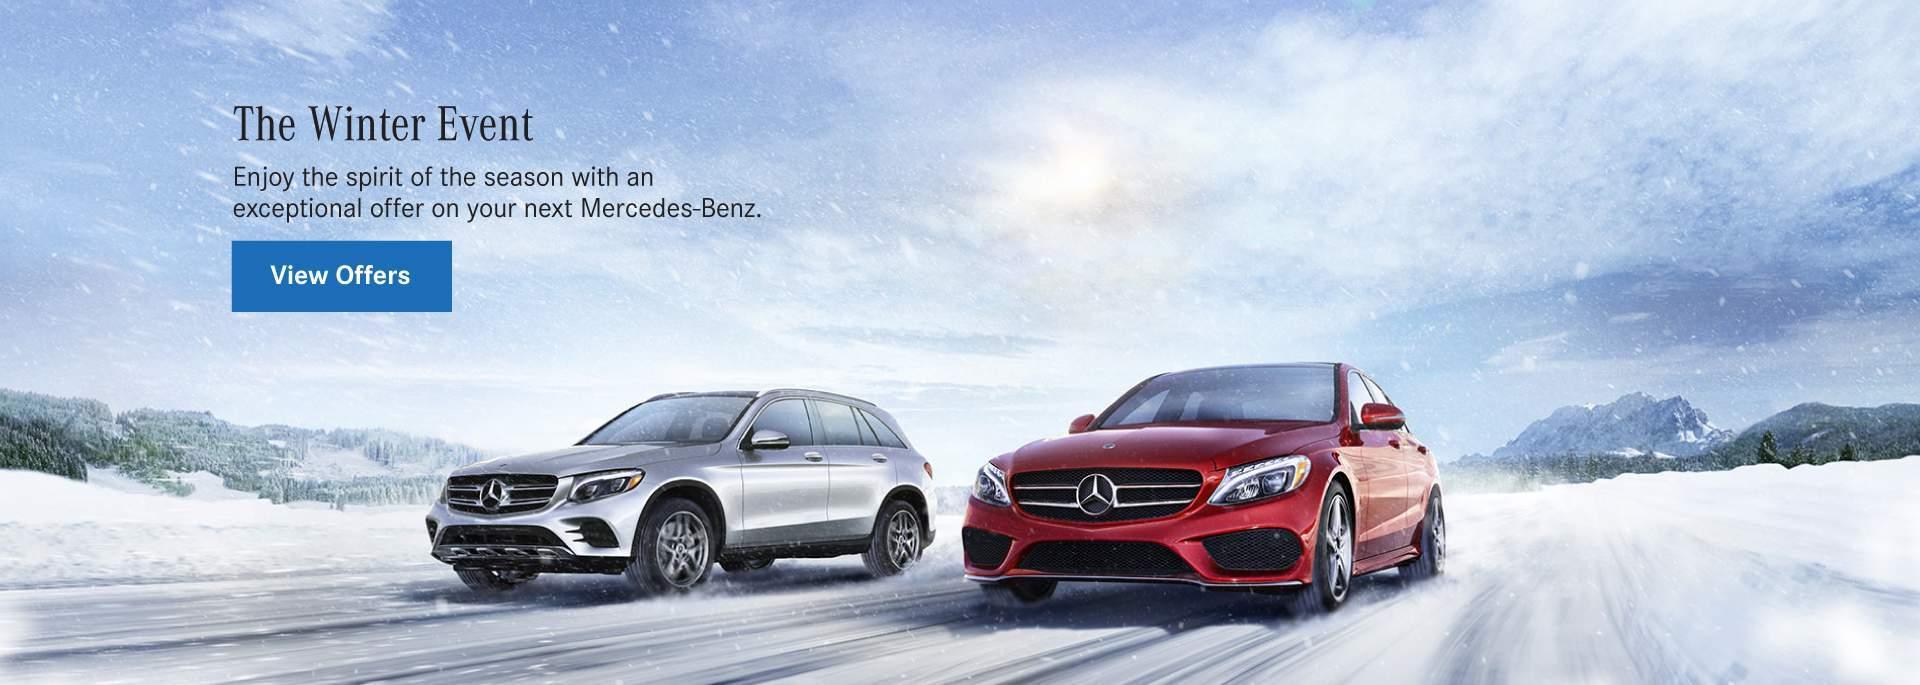 Mercedes benz of manchester luxury car dealership serving for Mercedes benz manchester used cars